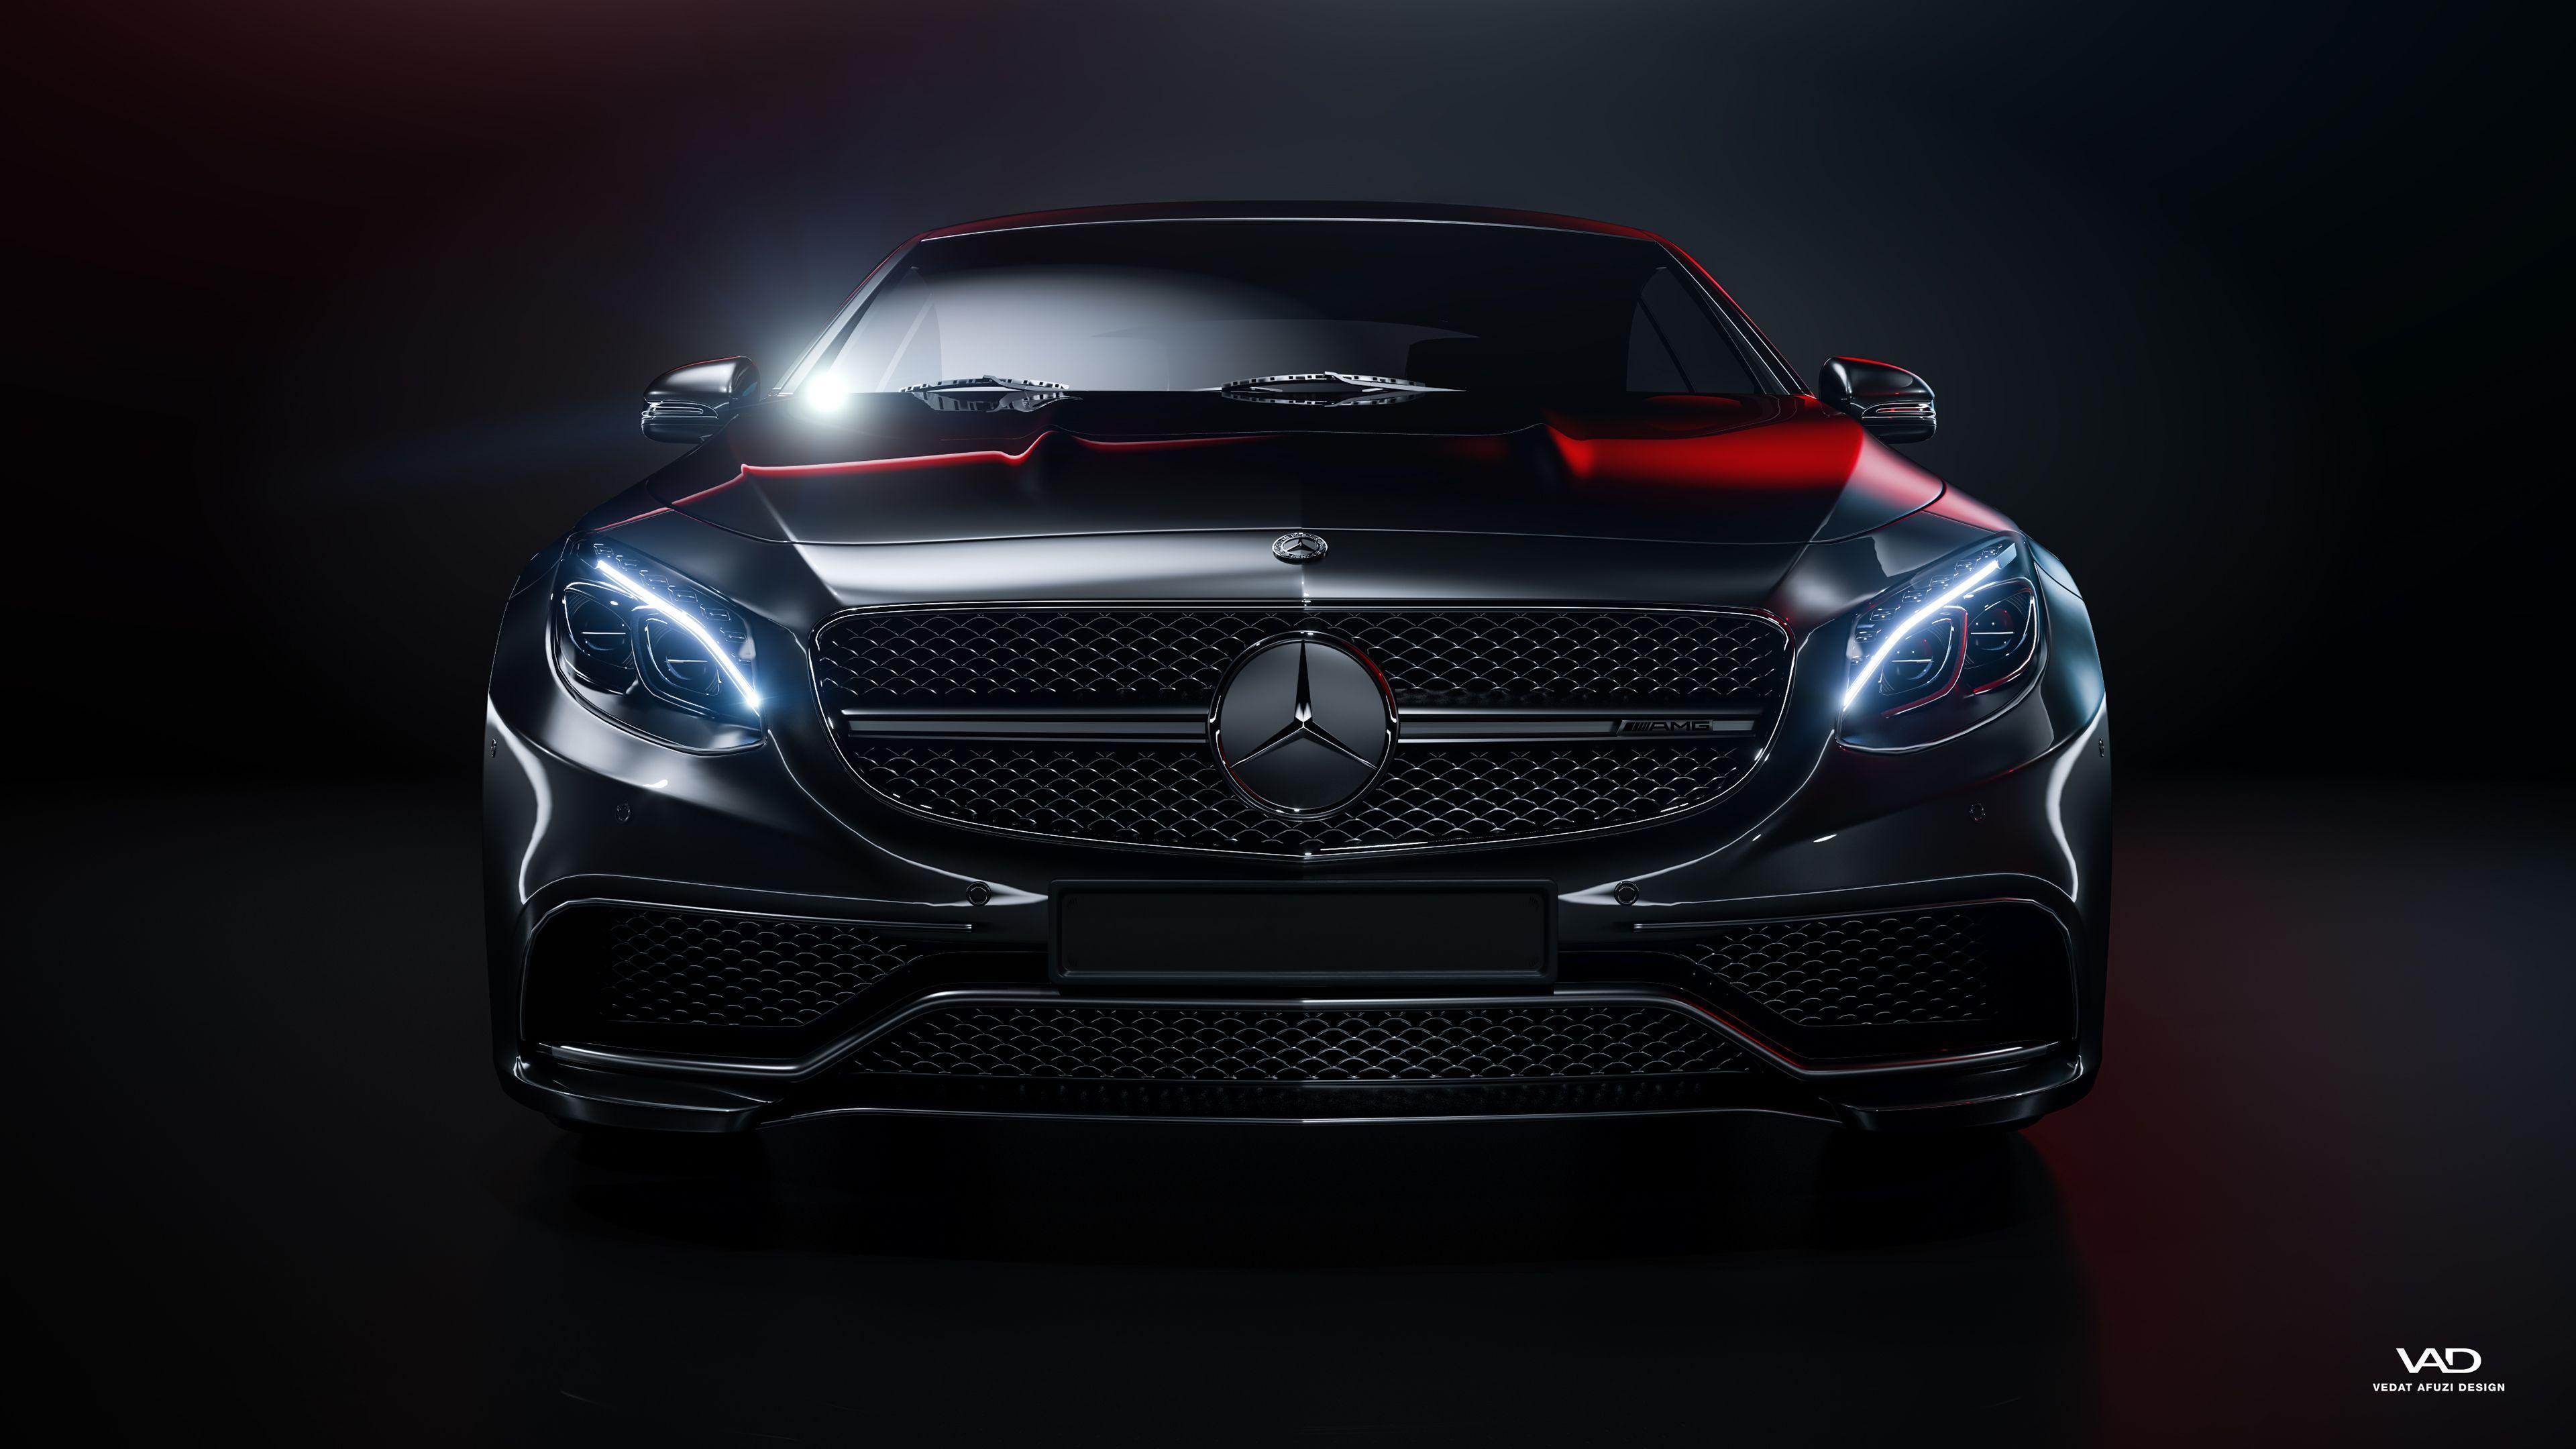 Mercedes Amg 4k Wallpapers Top Free Mercedes Amg 4k